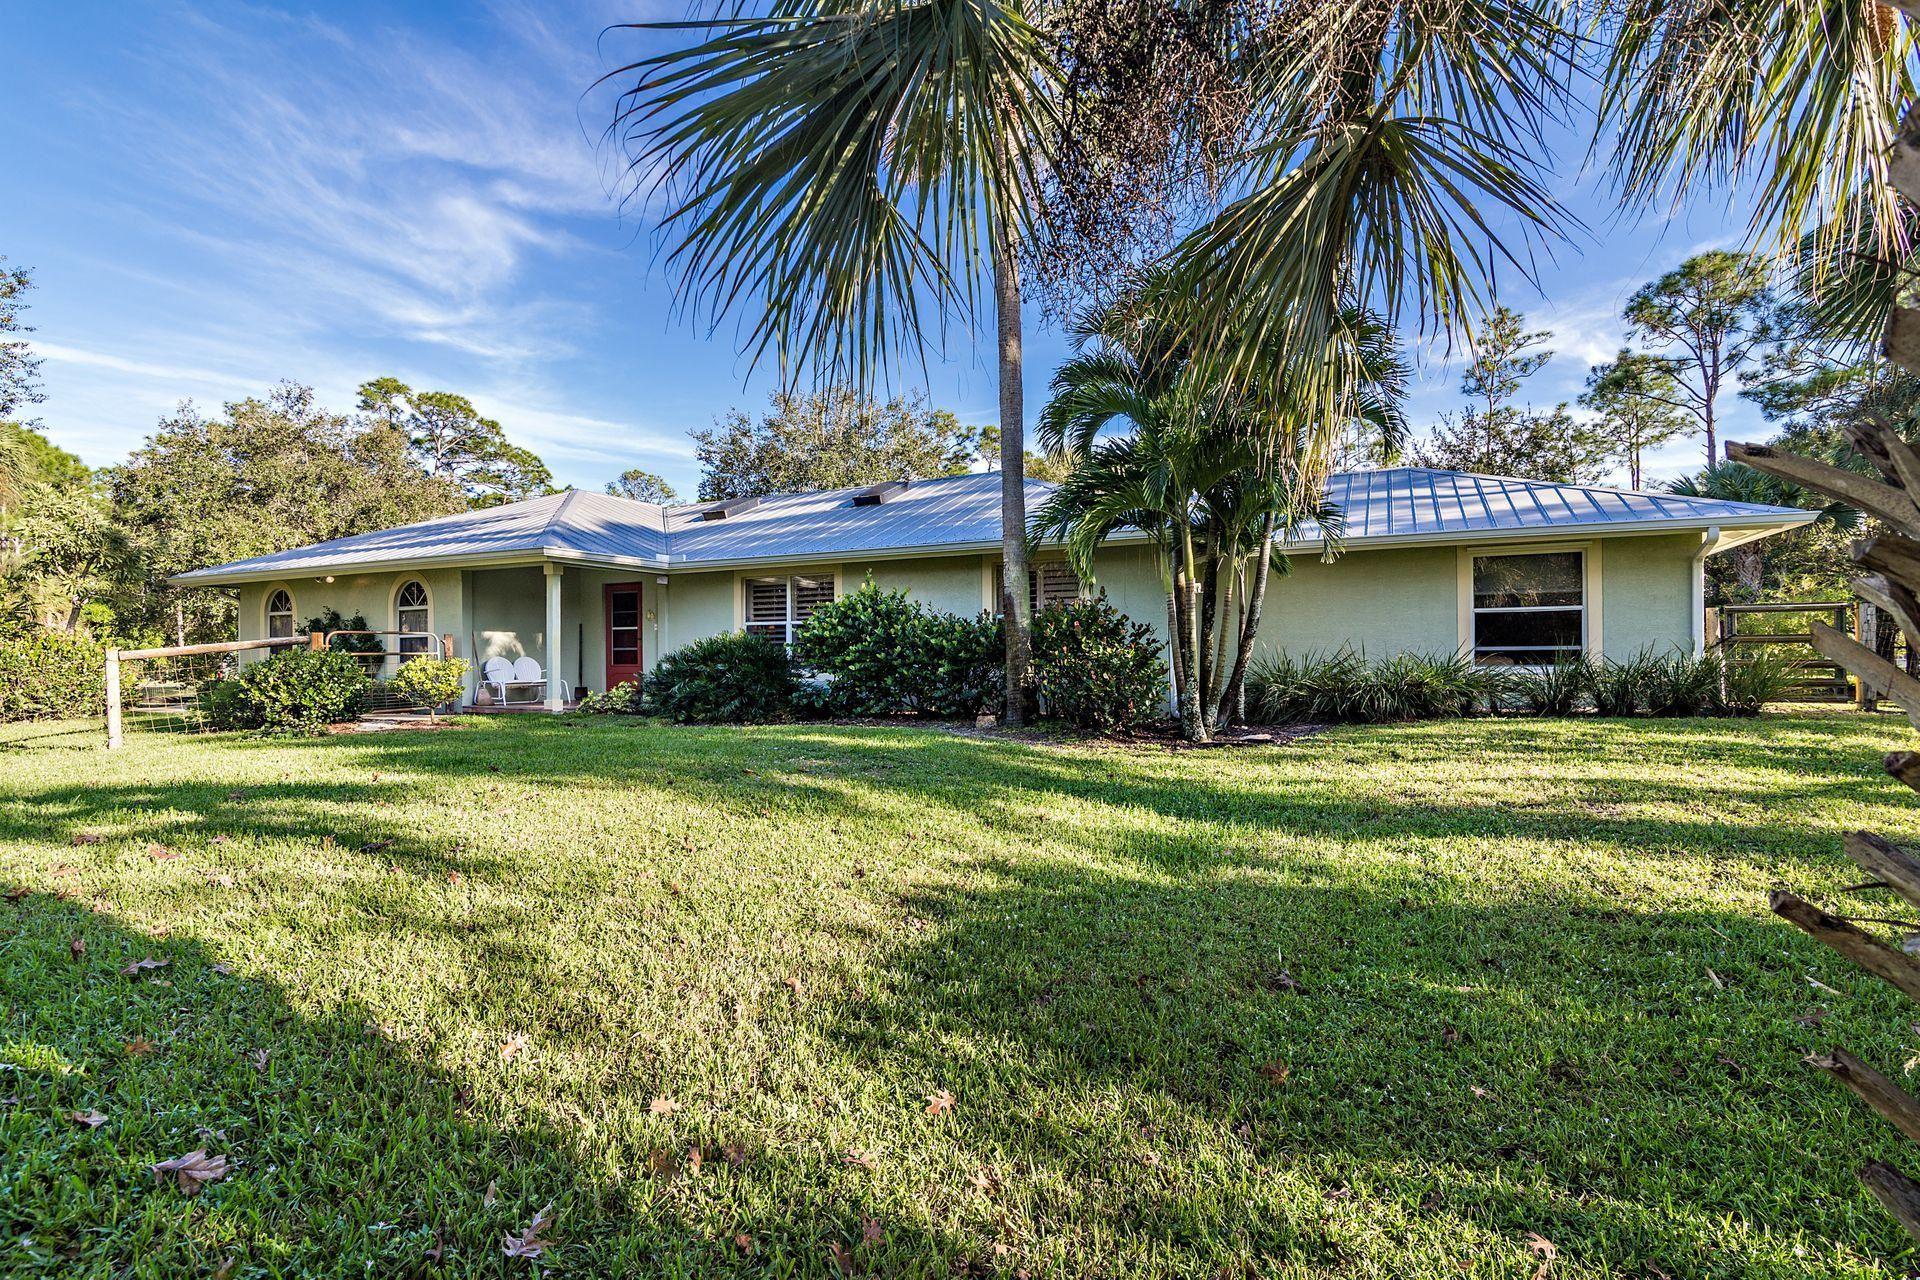 Photo for 11668 167th Place N, Jupiter, FL 33478 (MLS # RX-10582254)